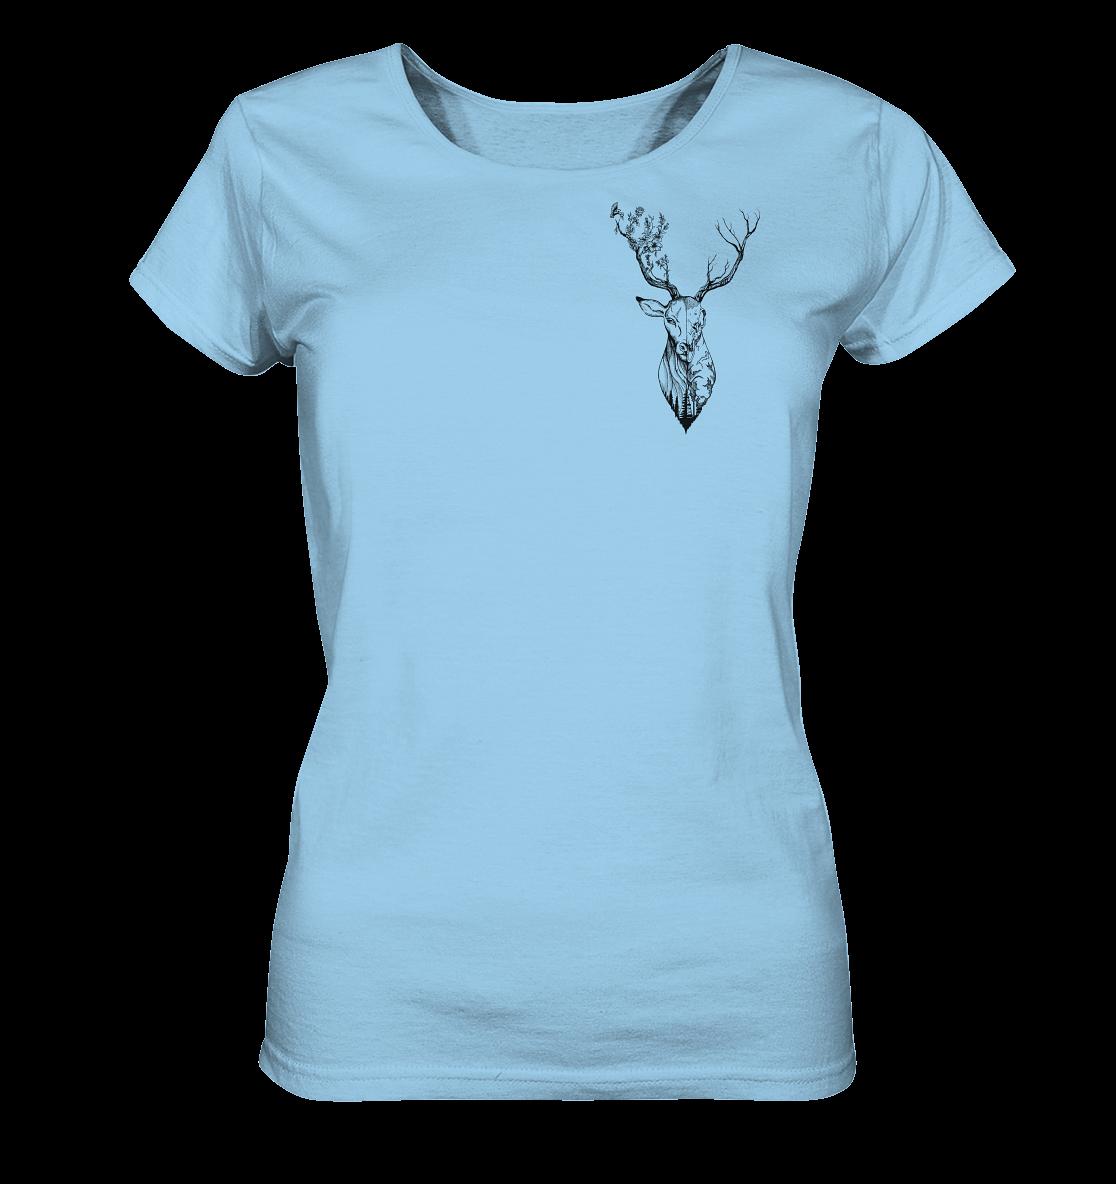 front-ladies-organic-shirt-9fd0ed-1116x-7.png